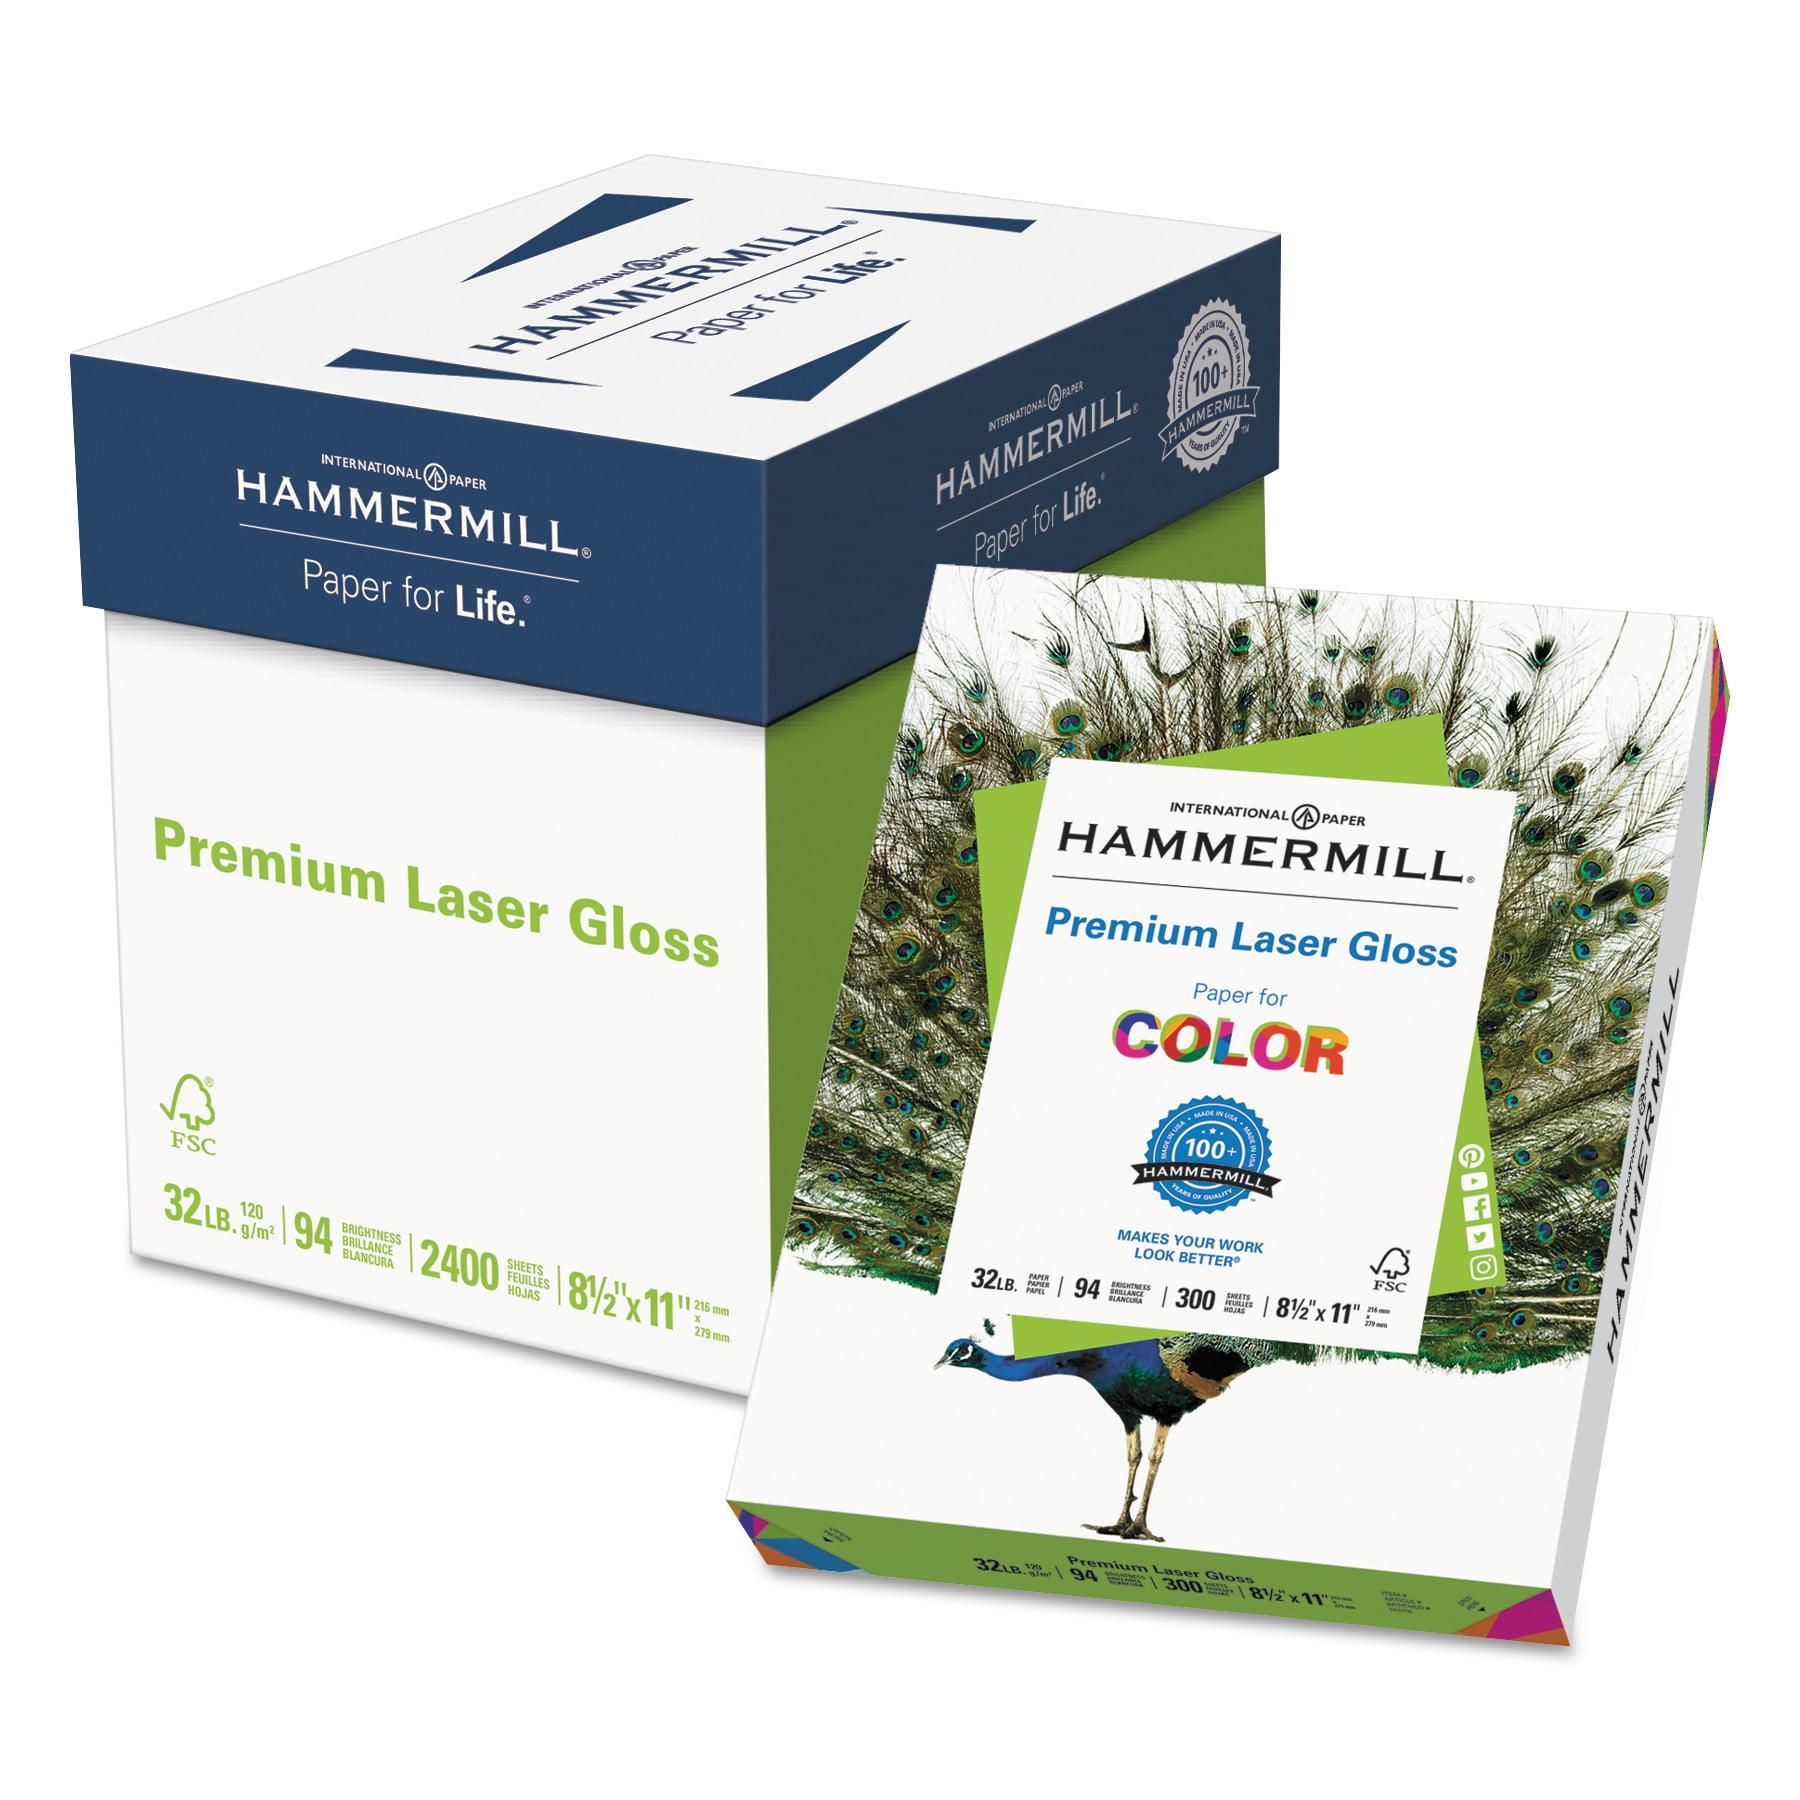 Hammermill Premium Laser Gloss Paper, 94 Bright, 32lb, 8-1/2 x 11, White, 300 Sheets/Pack -HAM163110